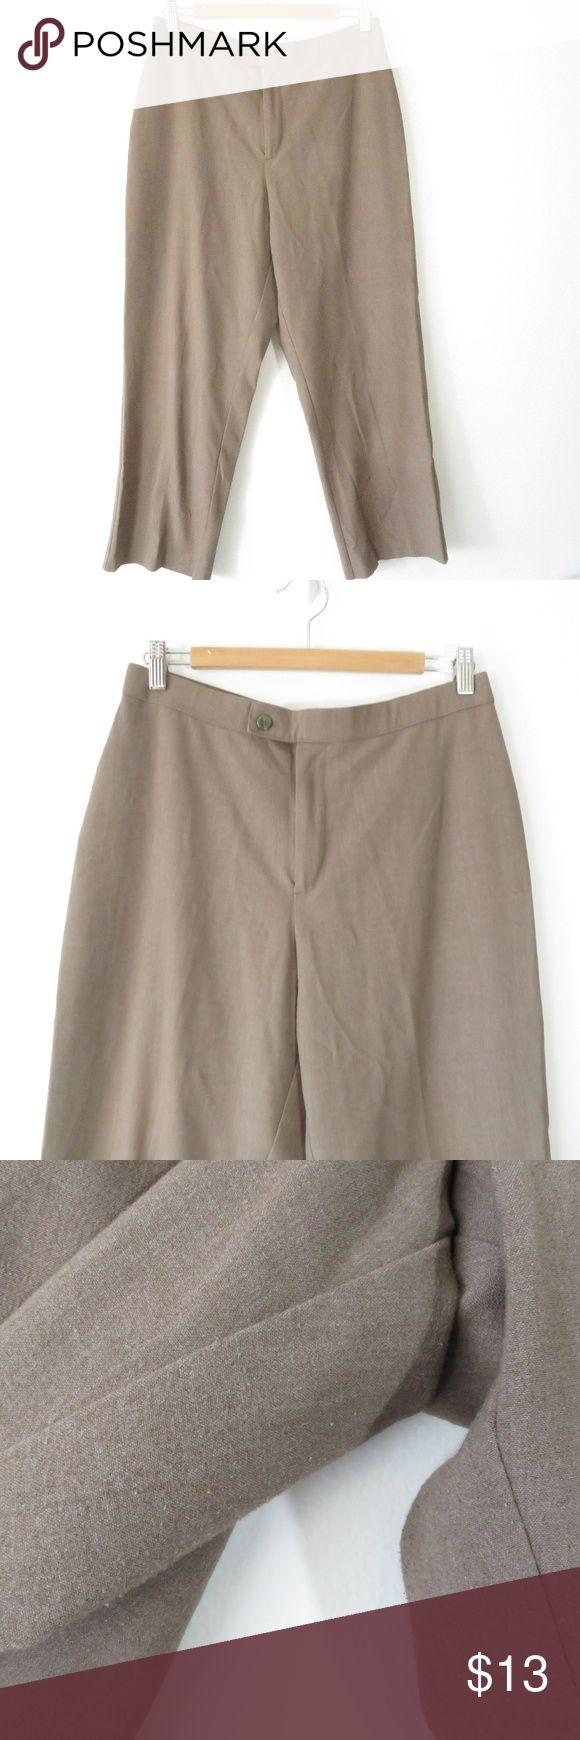 Briggs petite slacks 1